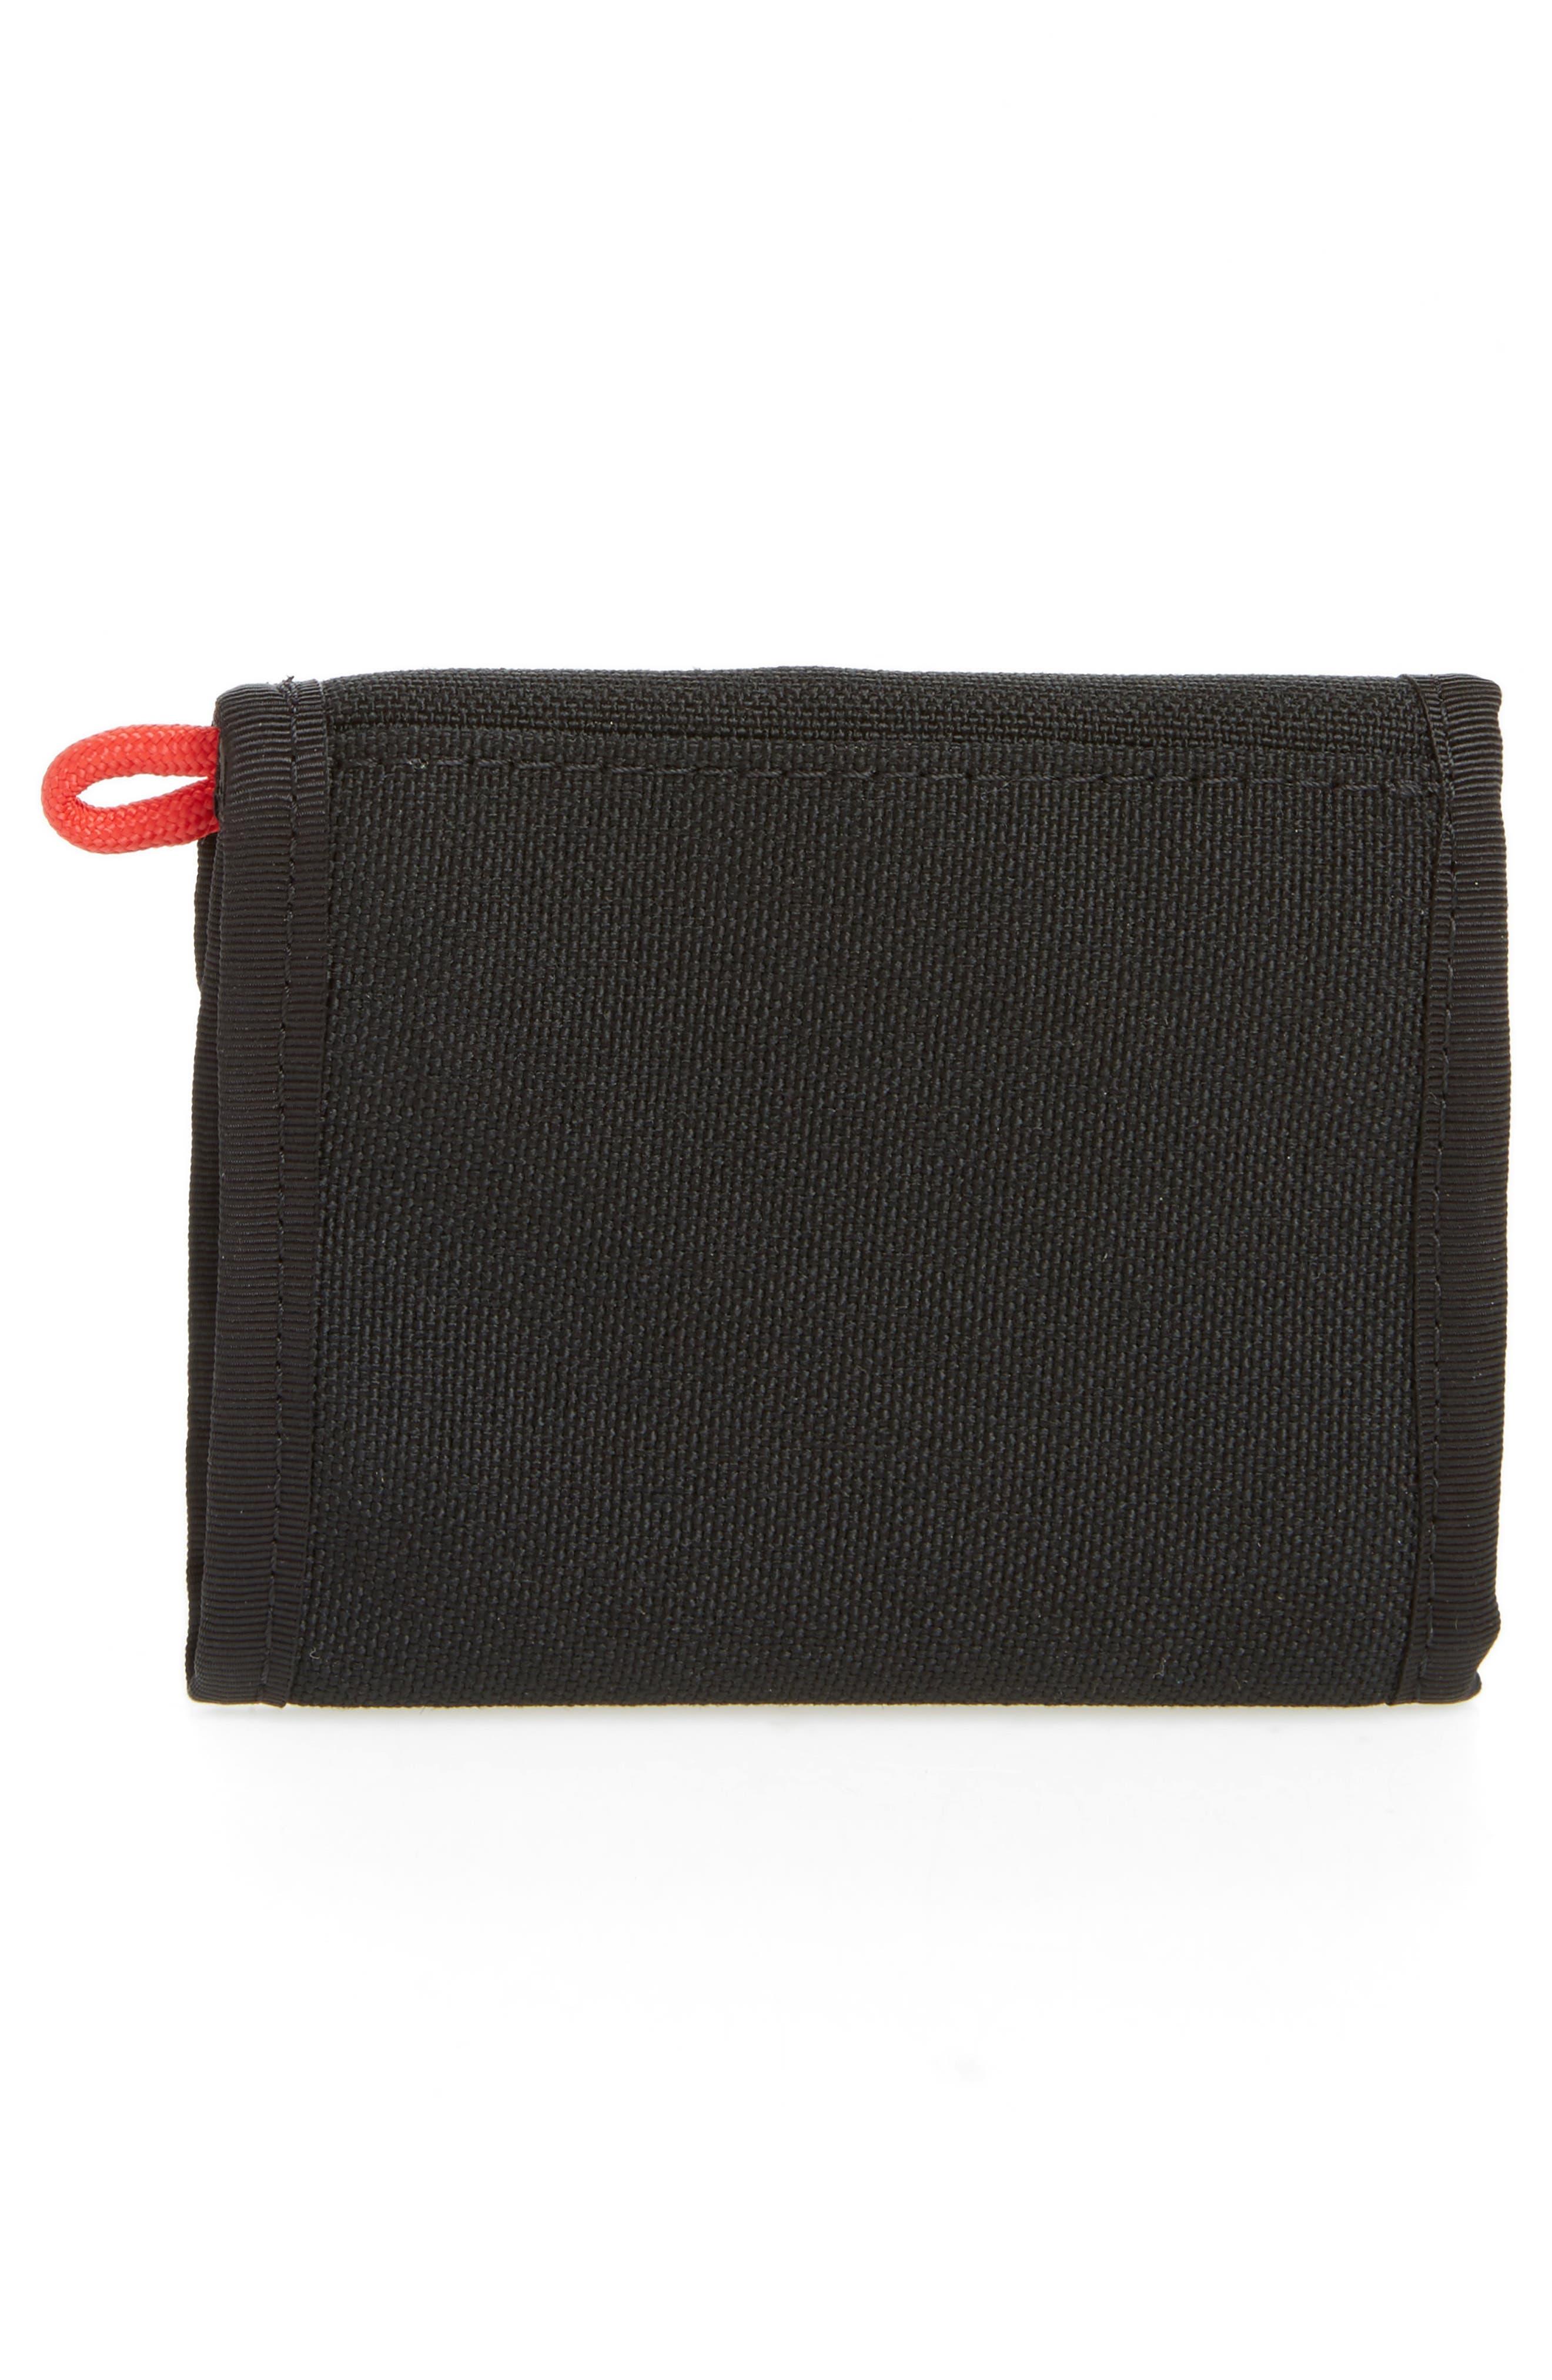 Snap Wallet,                             Alternate thumbnail 3, color,                             BLACK